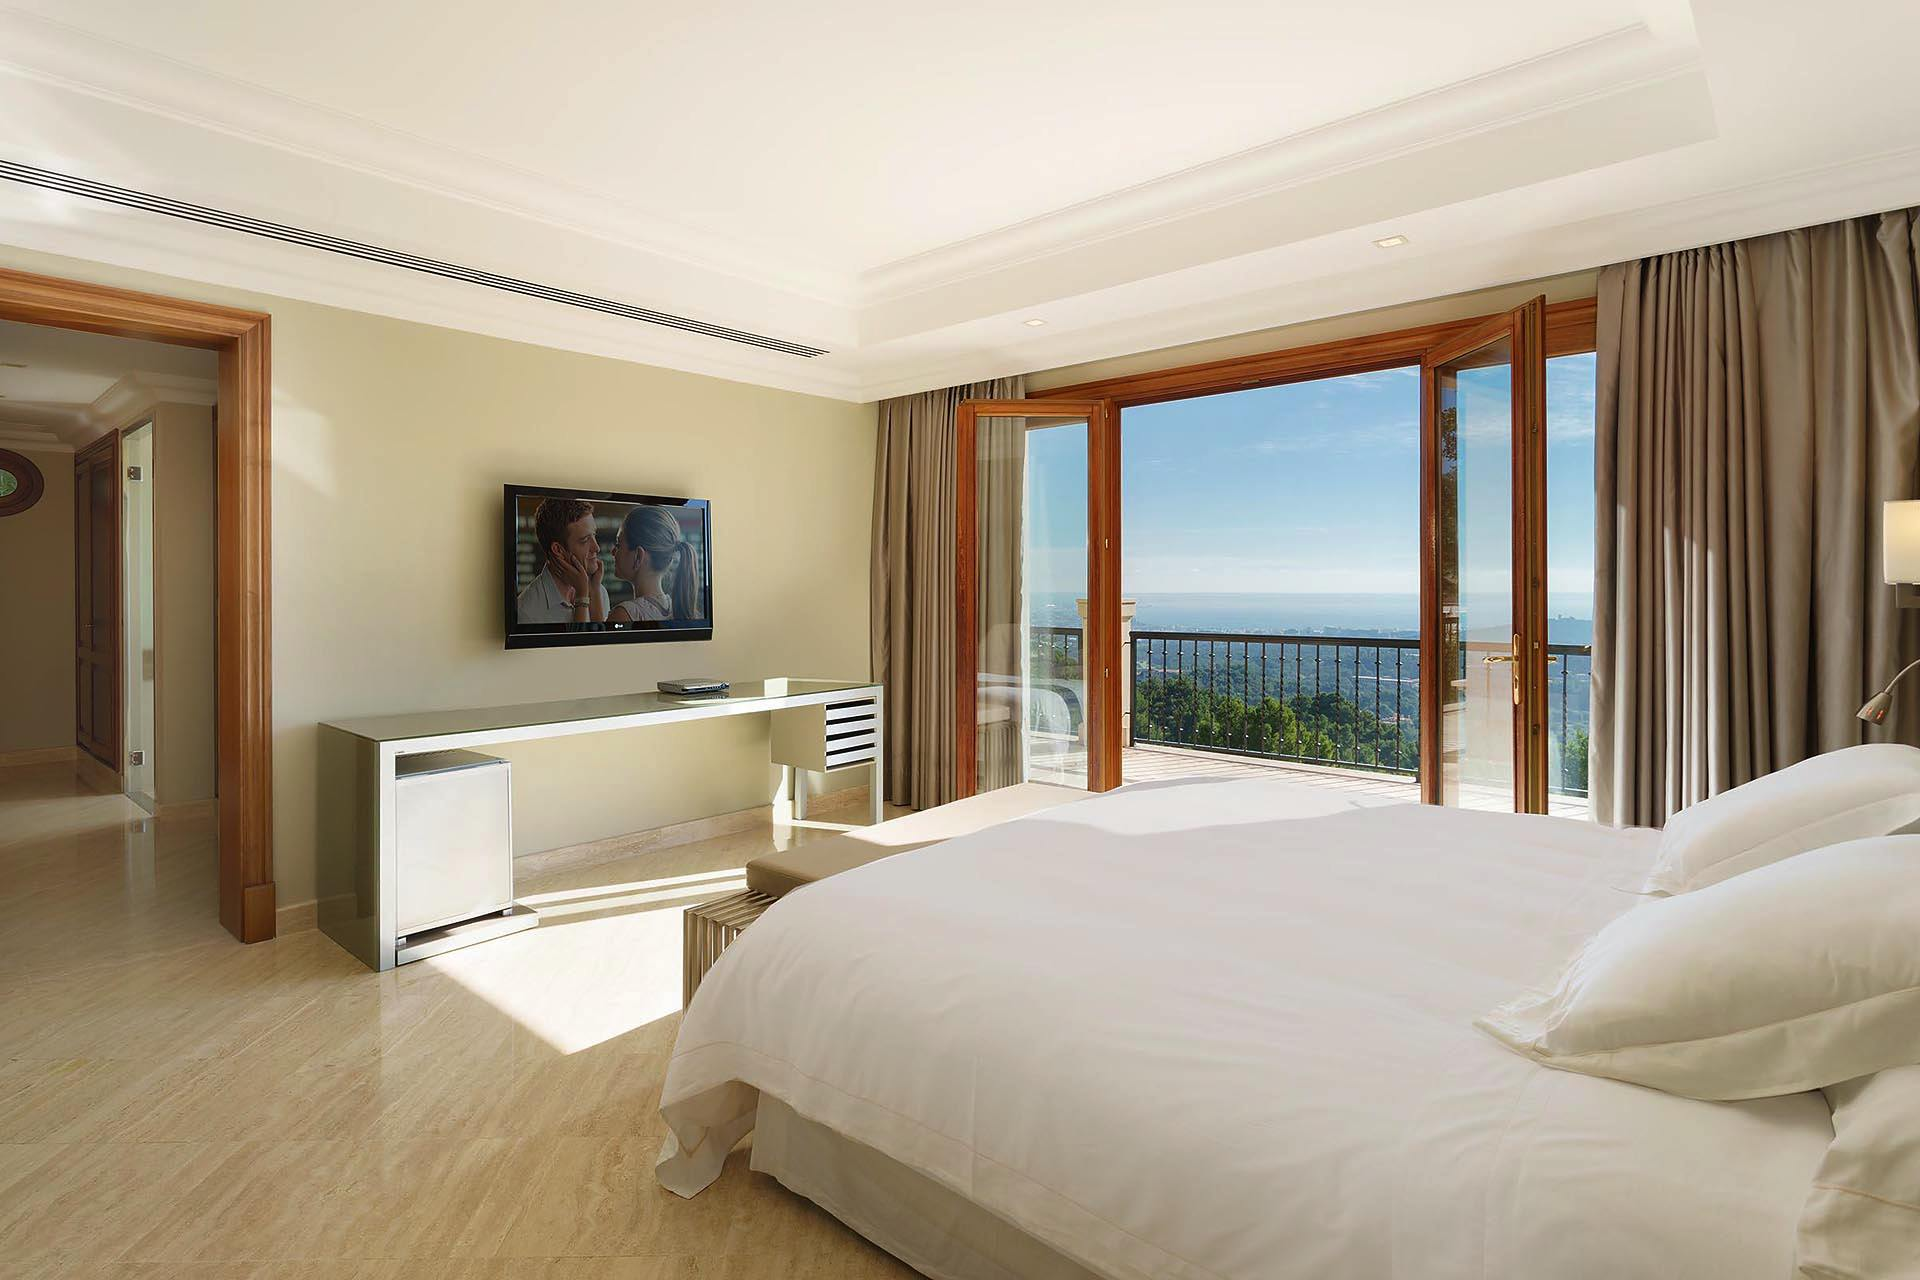 01-280 großzügige Villa nahe Palma de Mallorca Bild 37